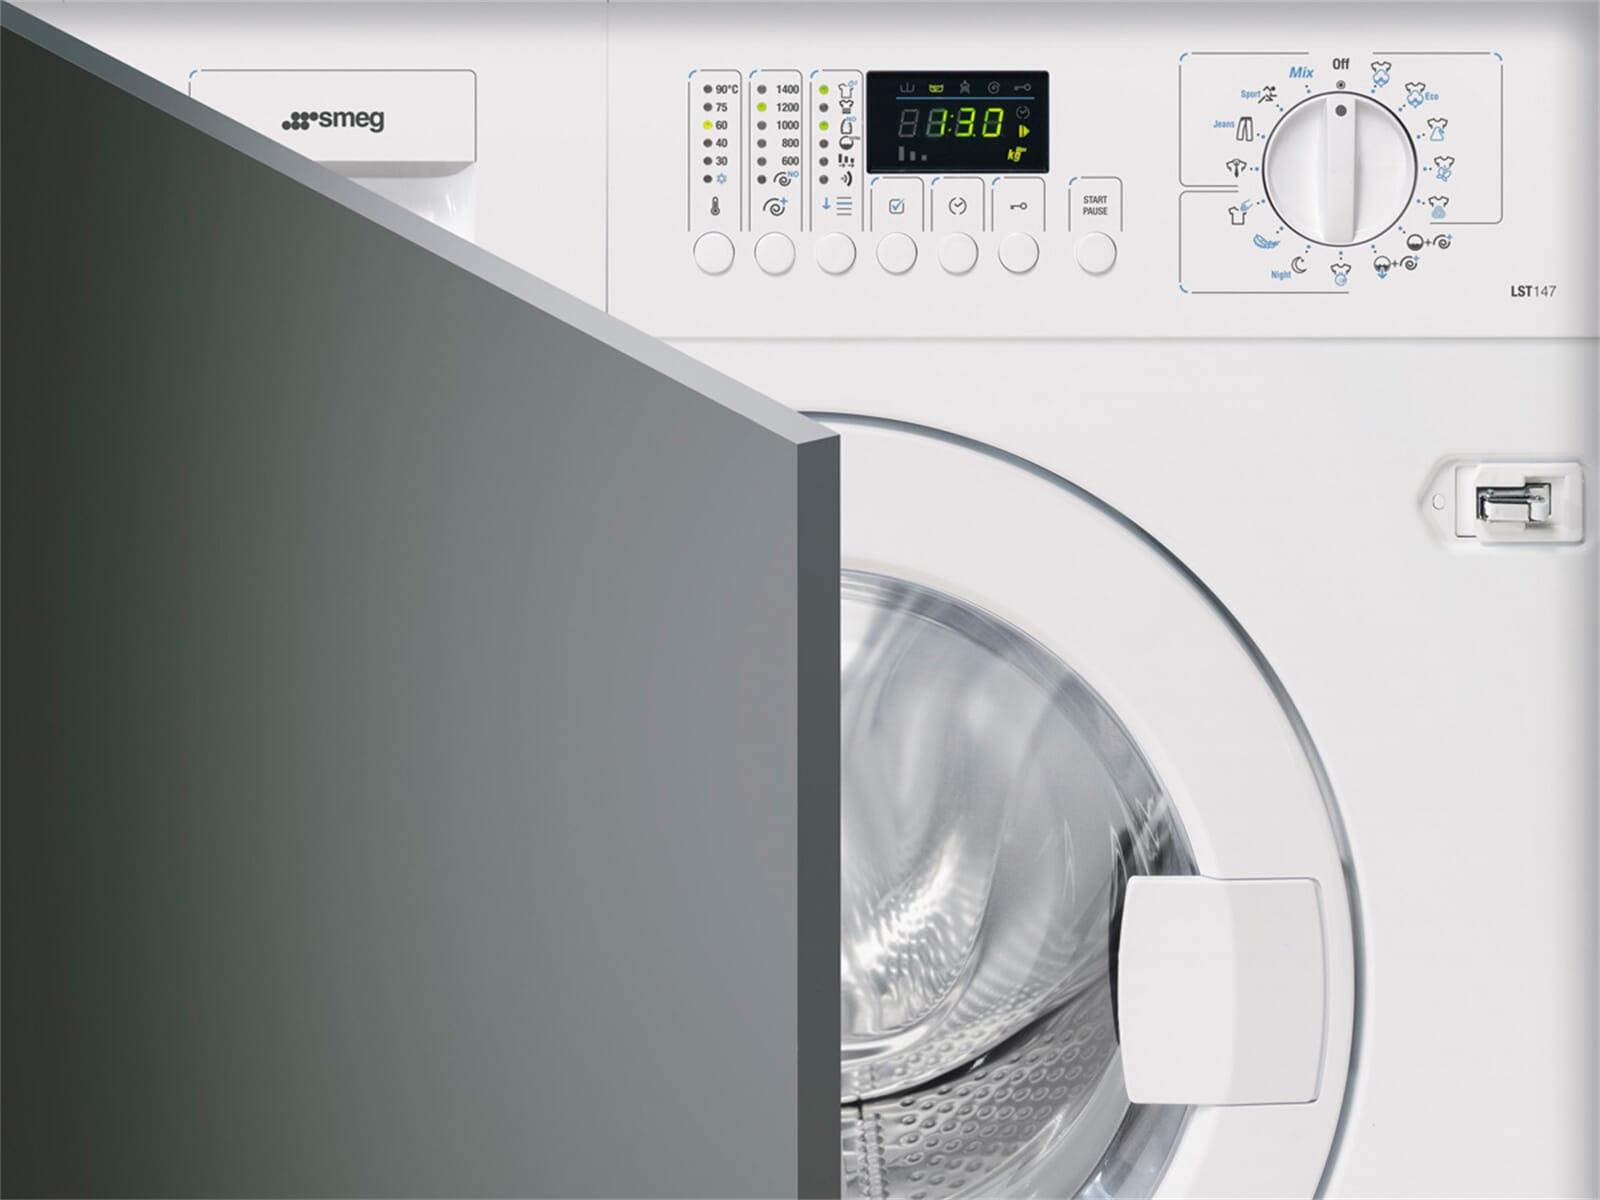 smeg lst147 einbau waschmaschine 7 kg 1400 u min a aqua stop waschvollautomat 8017709137755 ebay. Black Bedroom Furniture Sets. Home Design Ideas